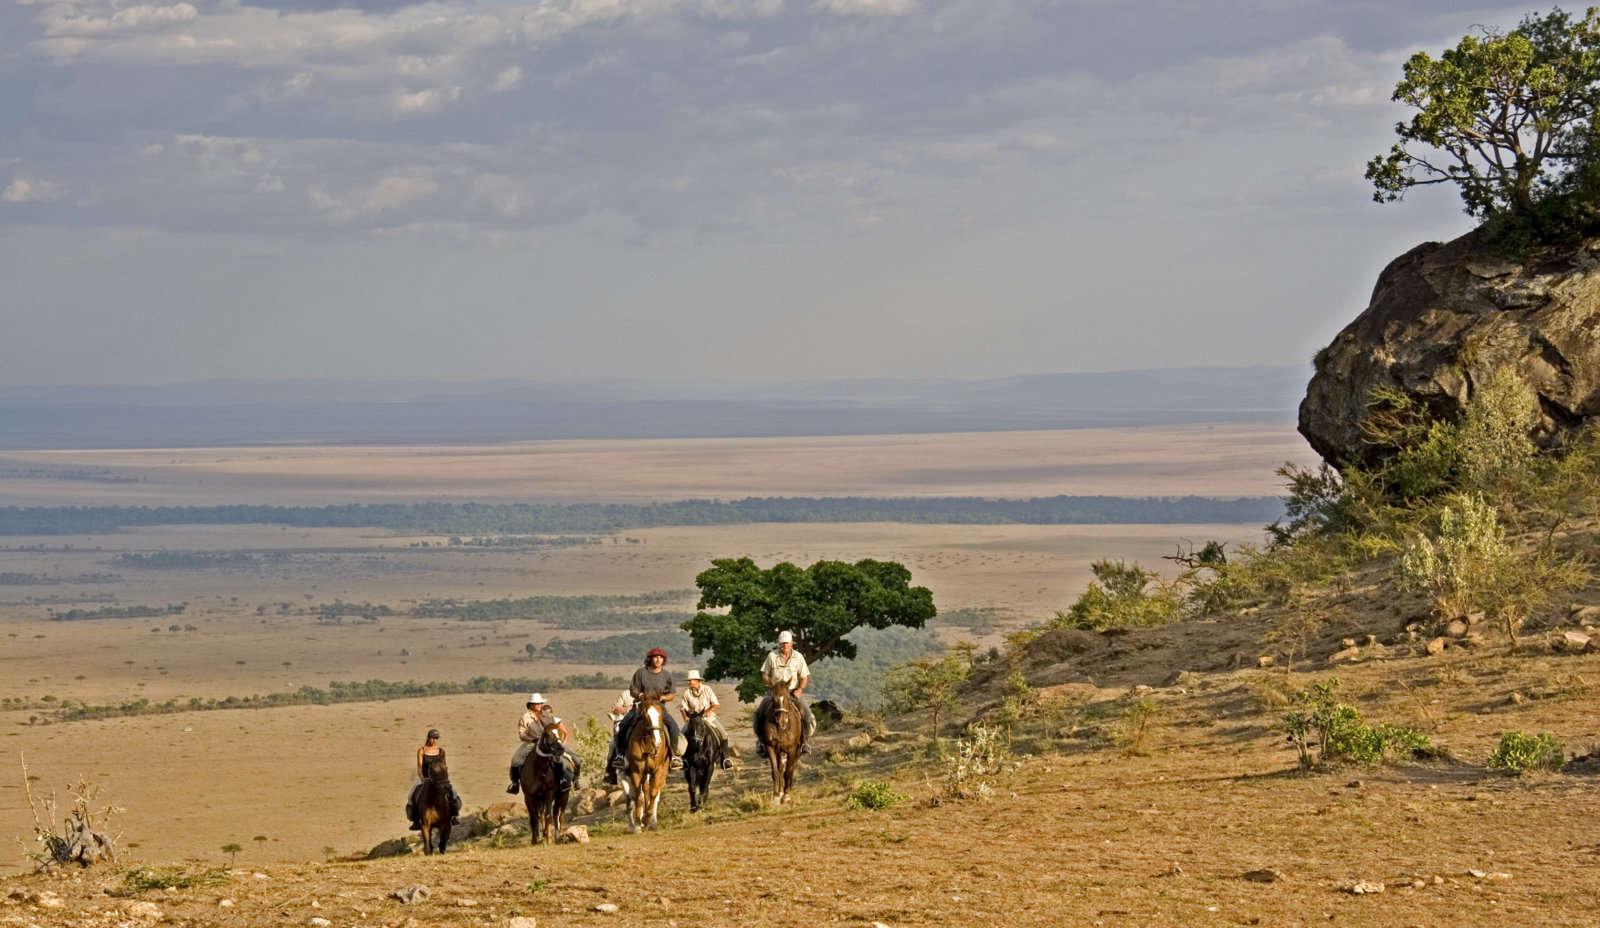 Kenya_Masai Mara_Equitours_OBH-Olololo-escarpment